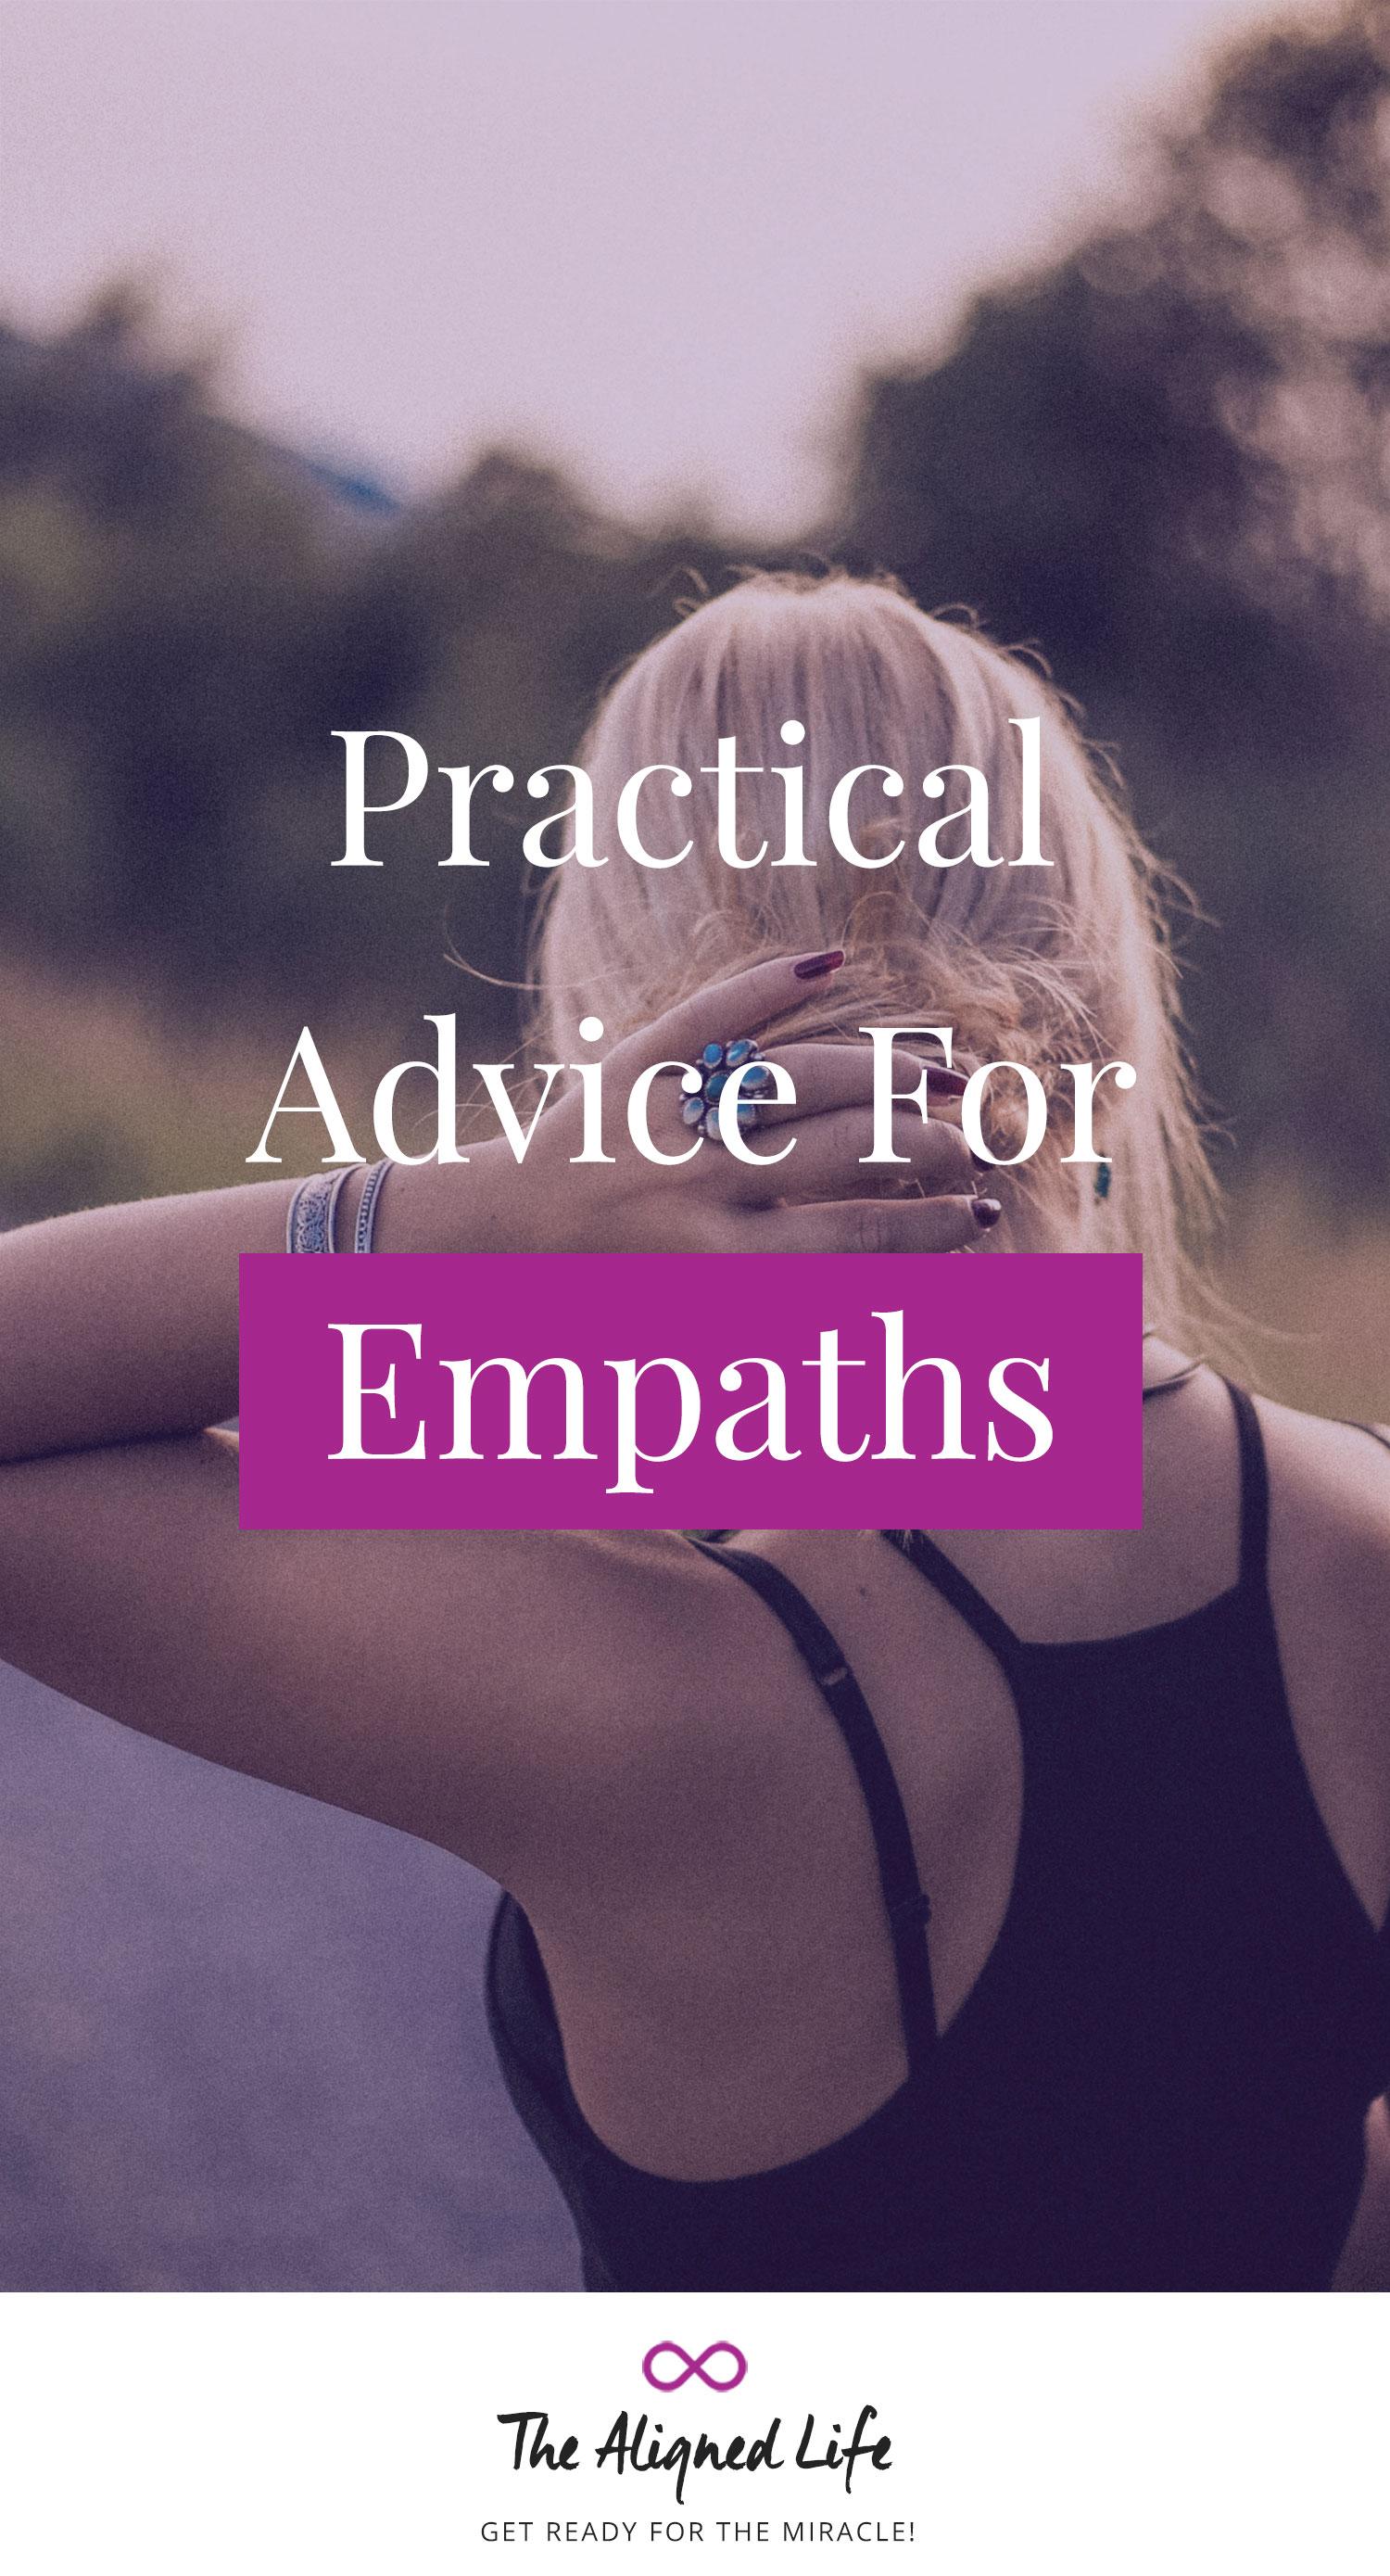 Practical Advice For Empaths